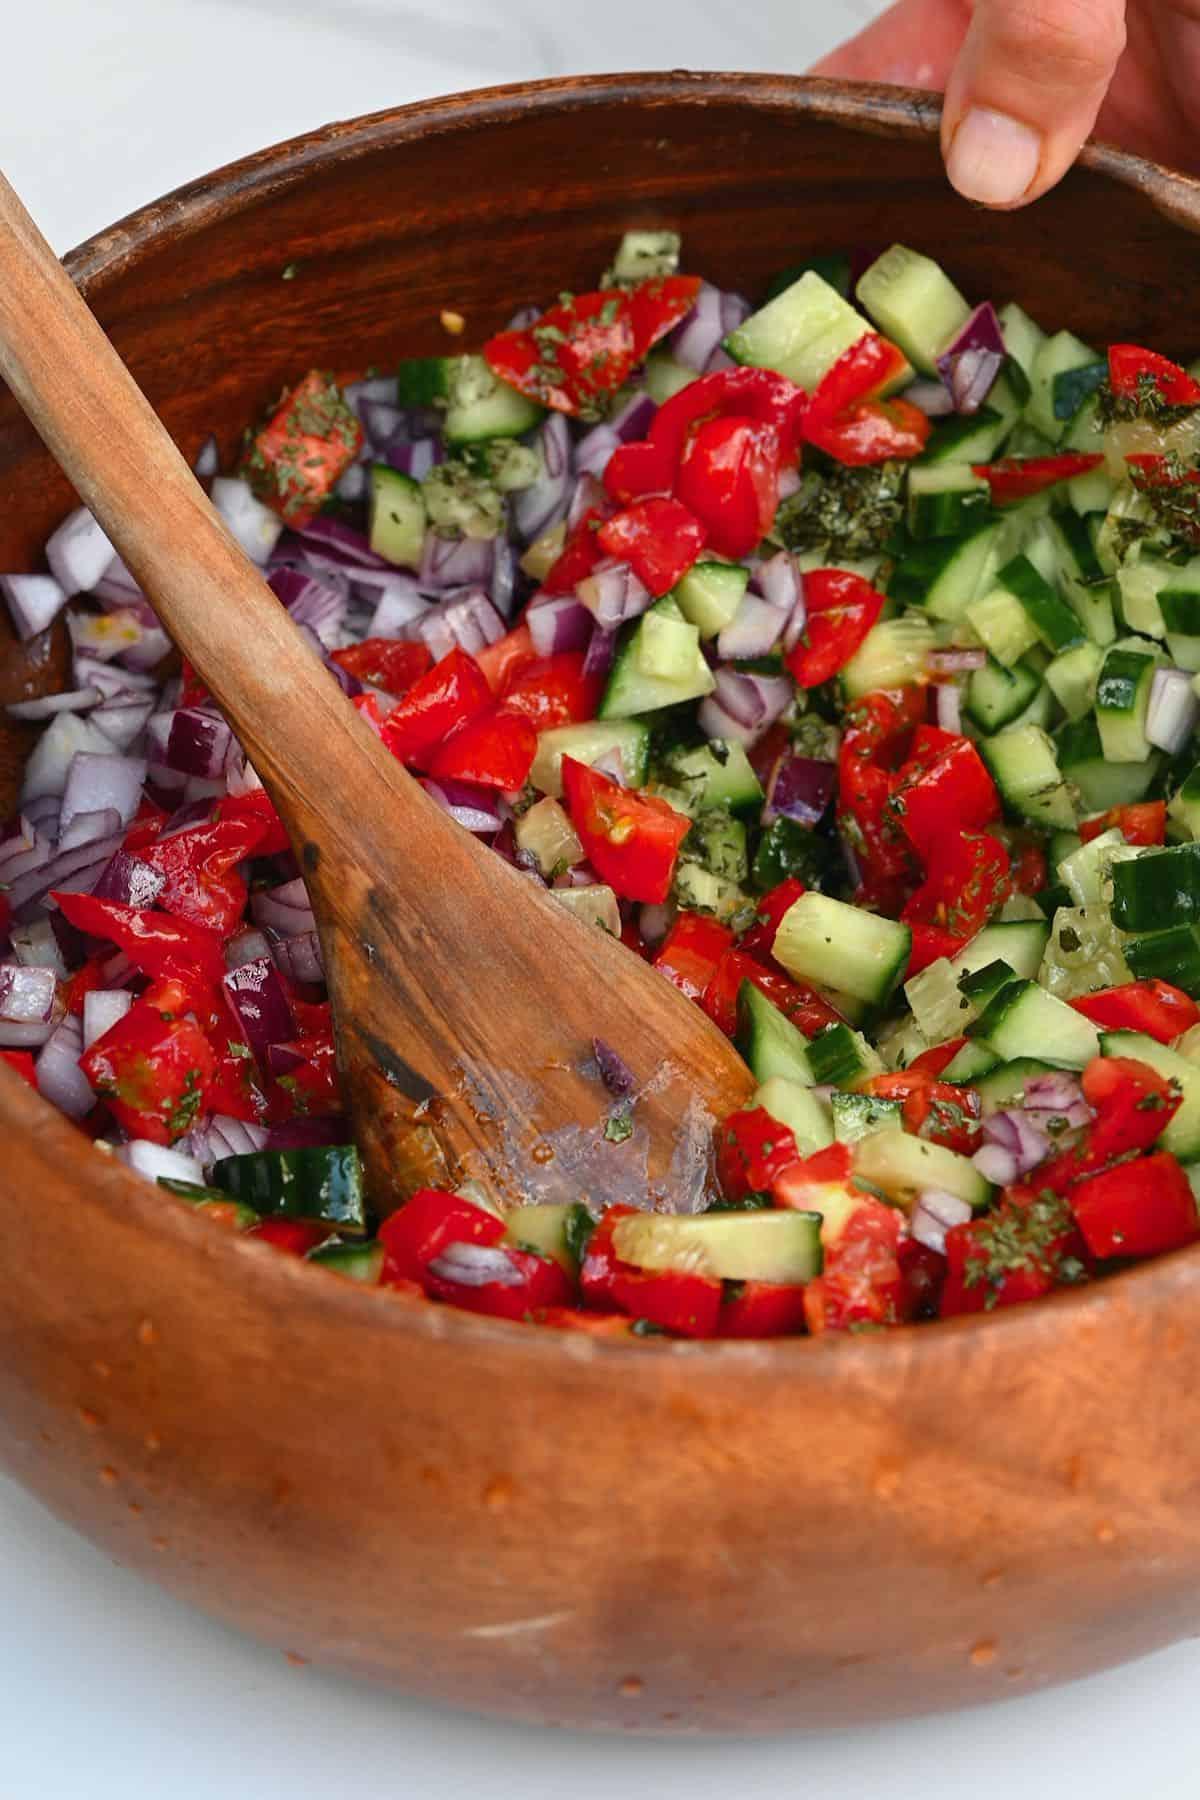 Mixing tomato cucumber salad